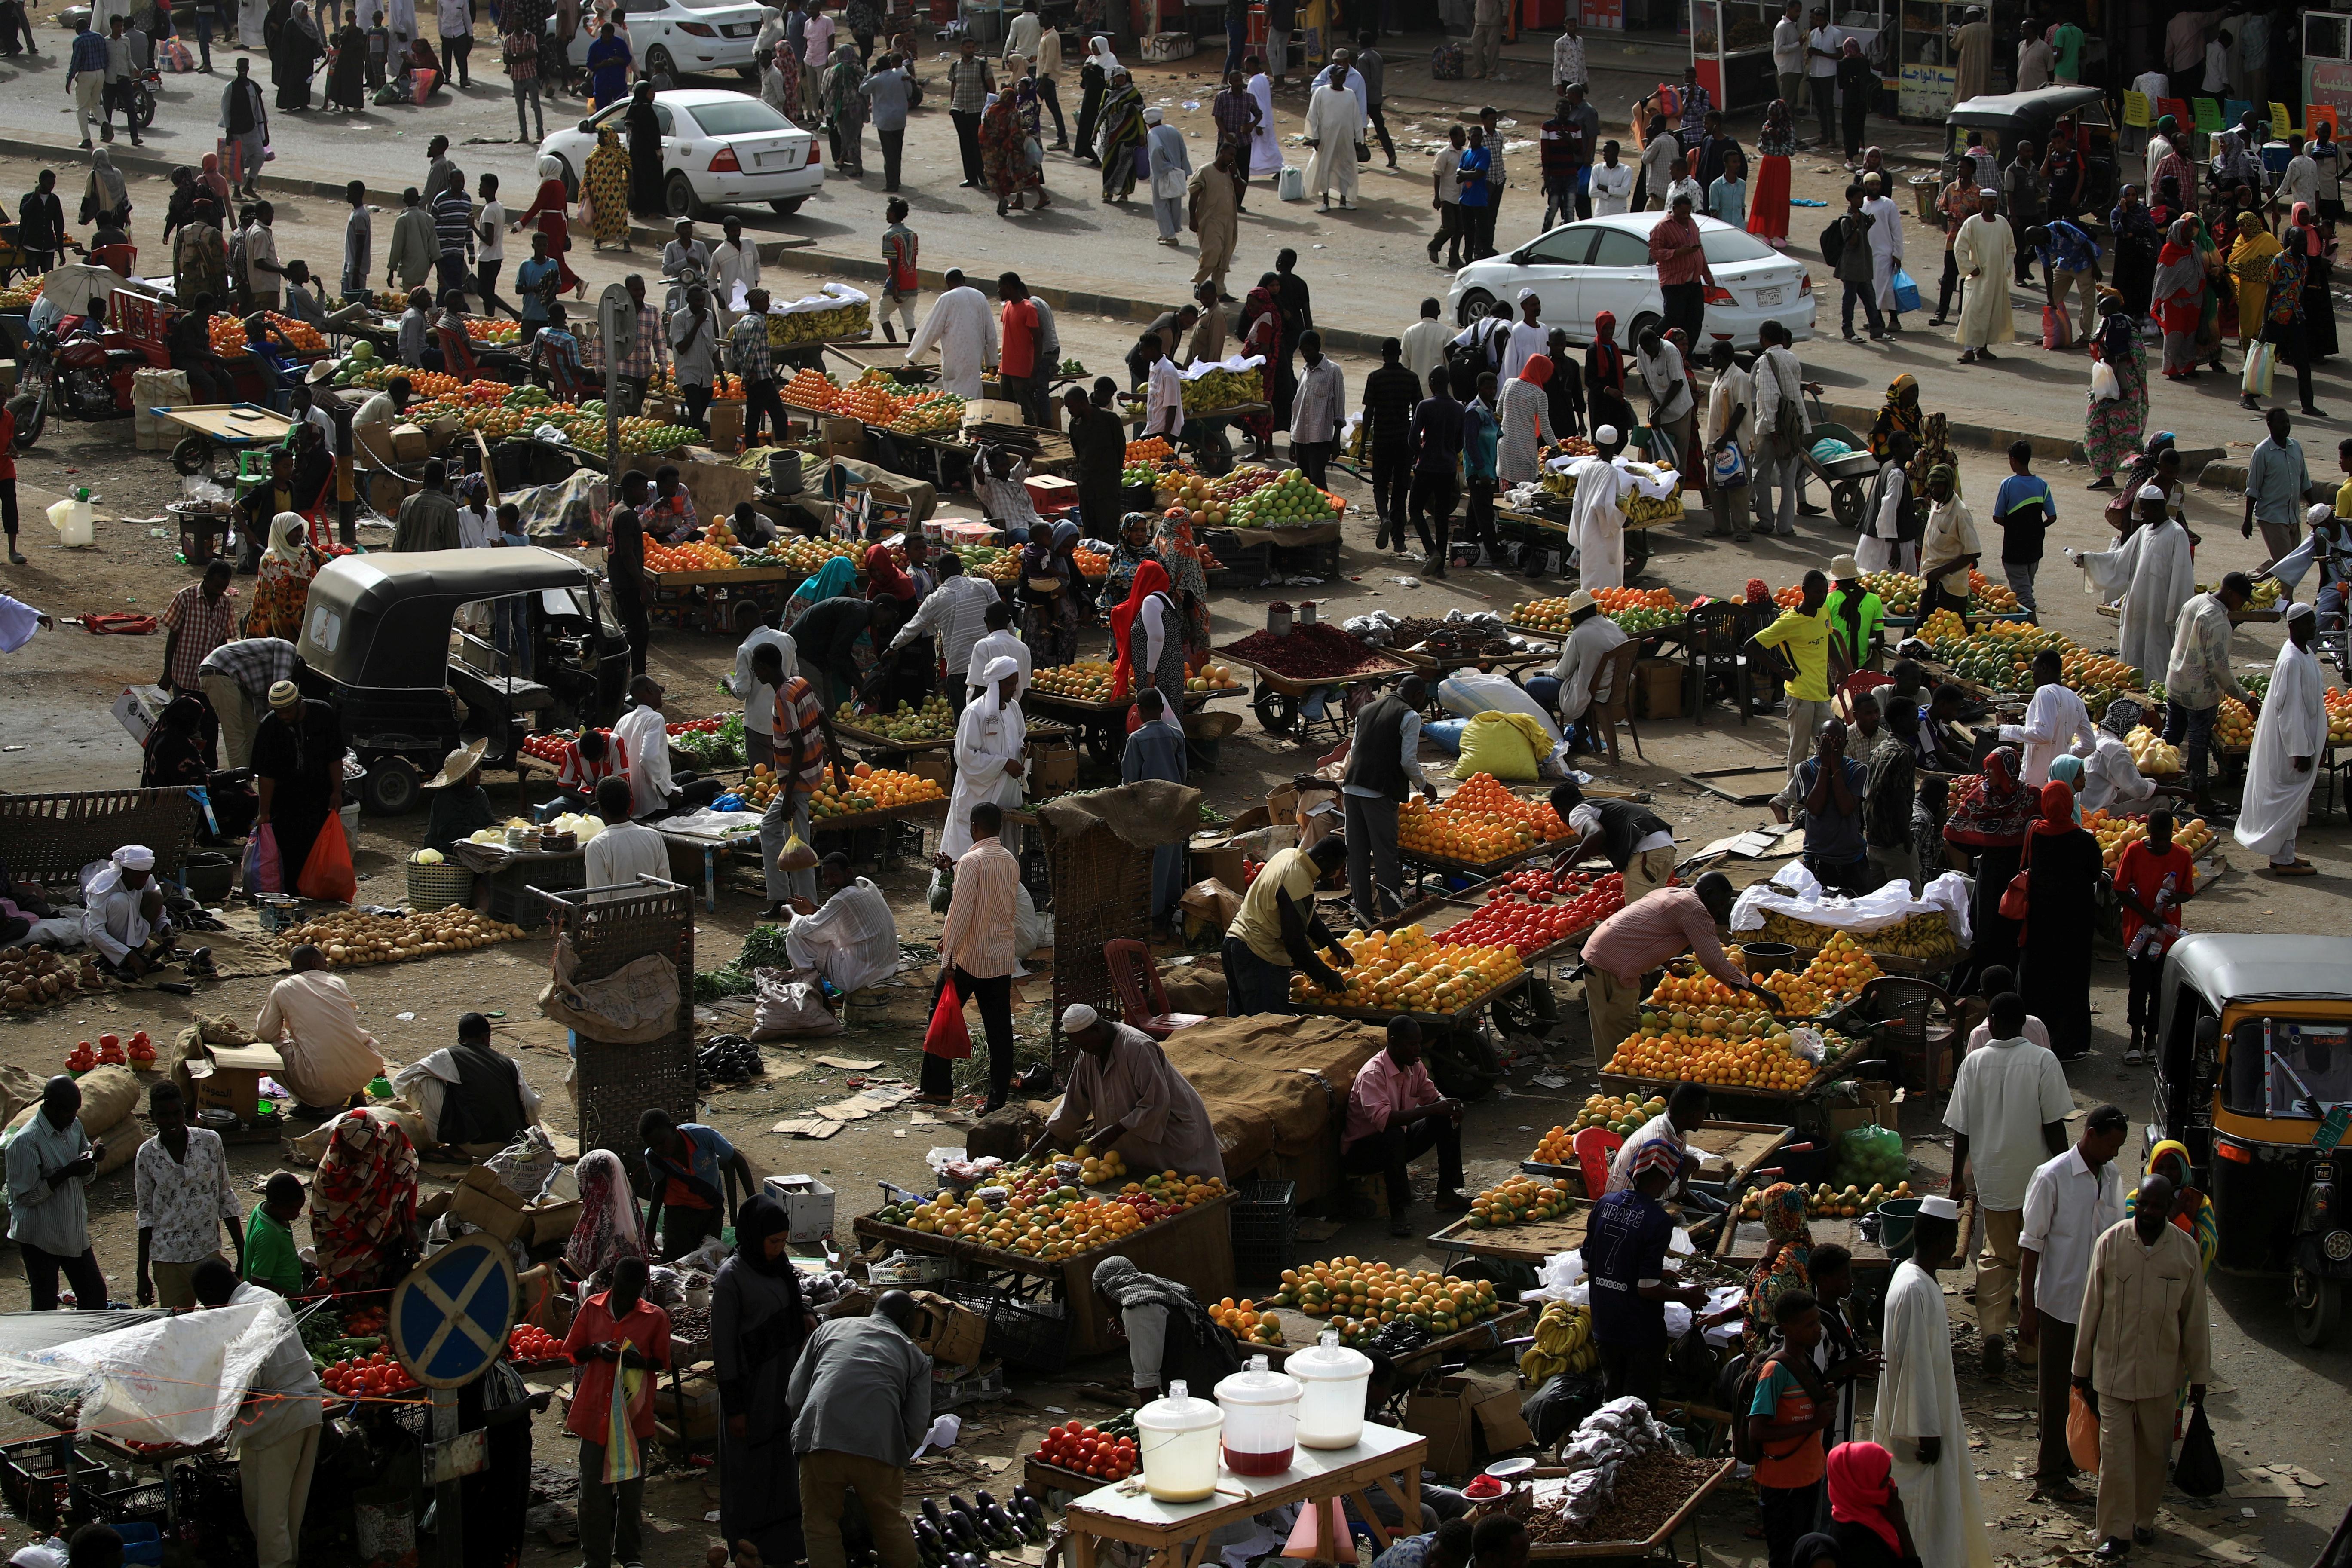 Sudanese residents shop in a bazaar in Khartoum, Sudan, May 4, 2019. REUTERS/Umit Bektas/File Photo